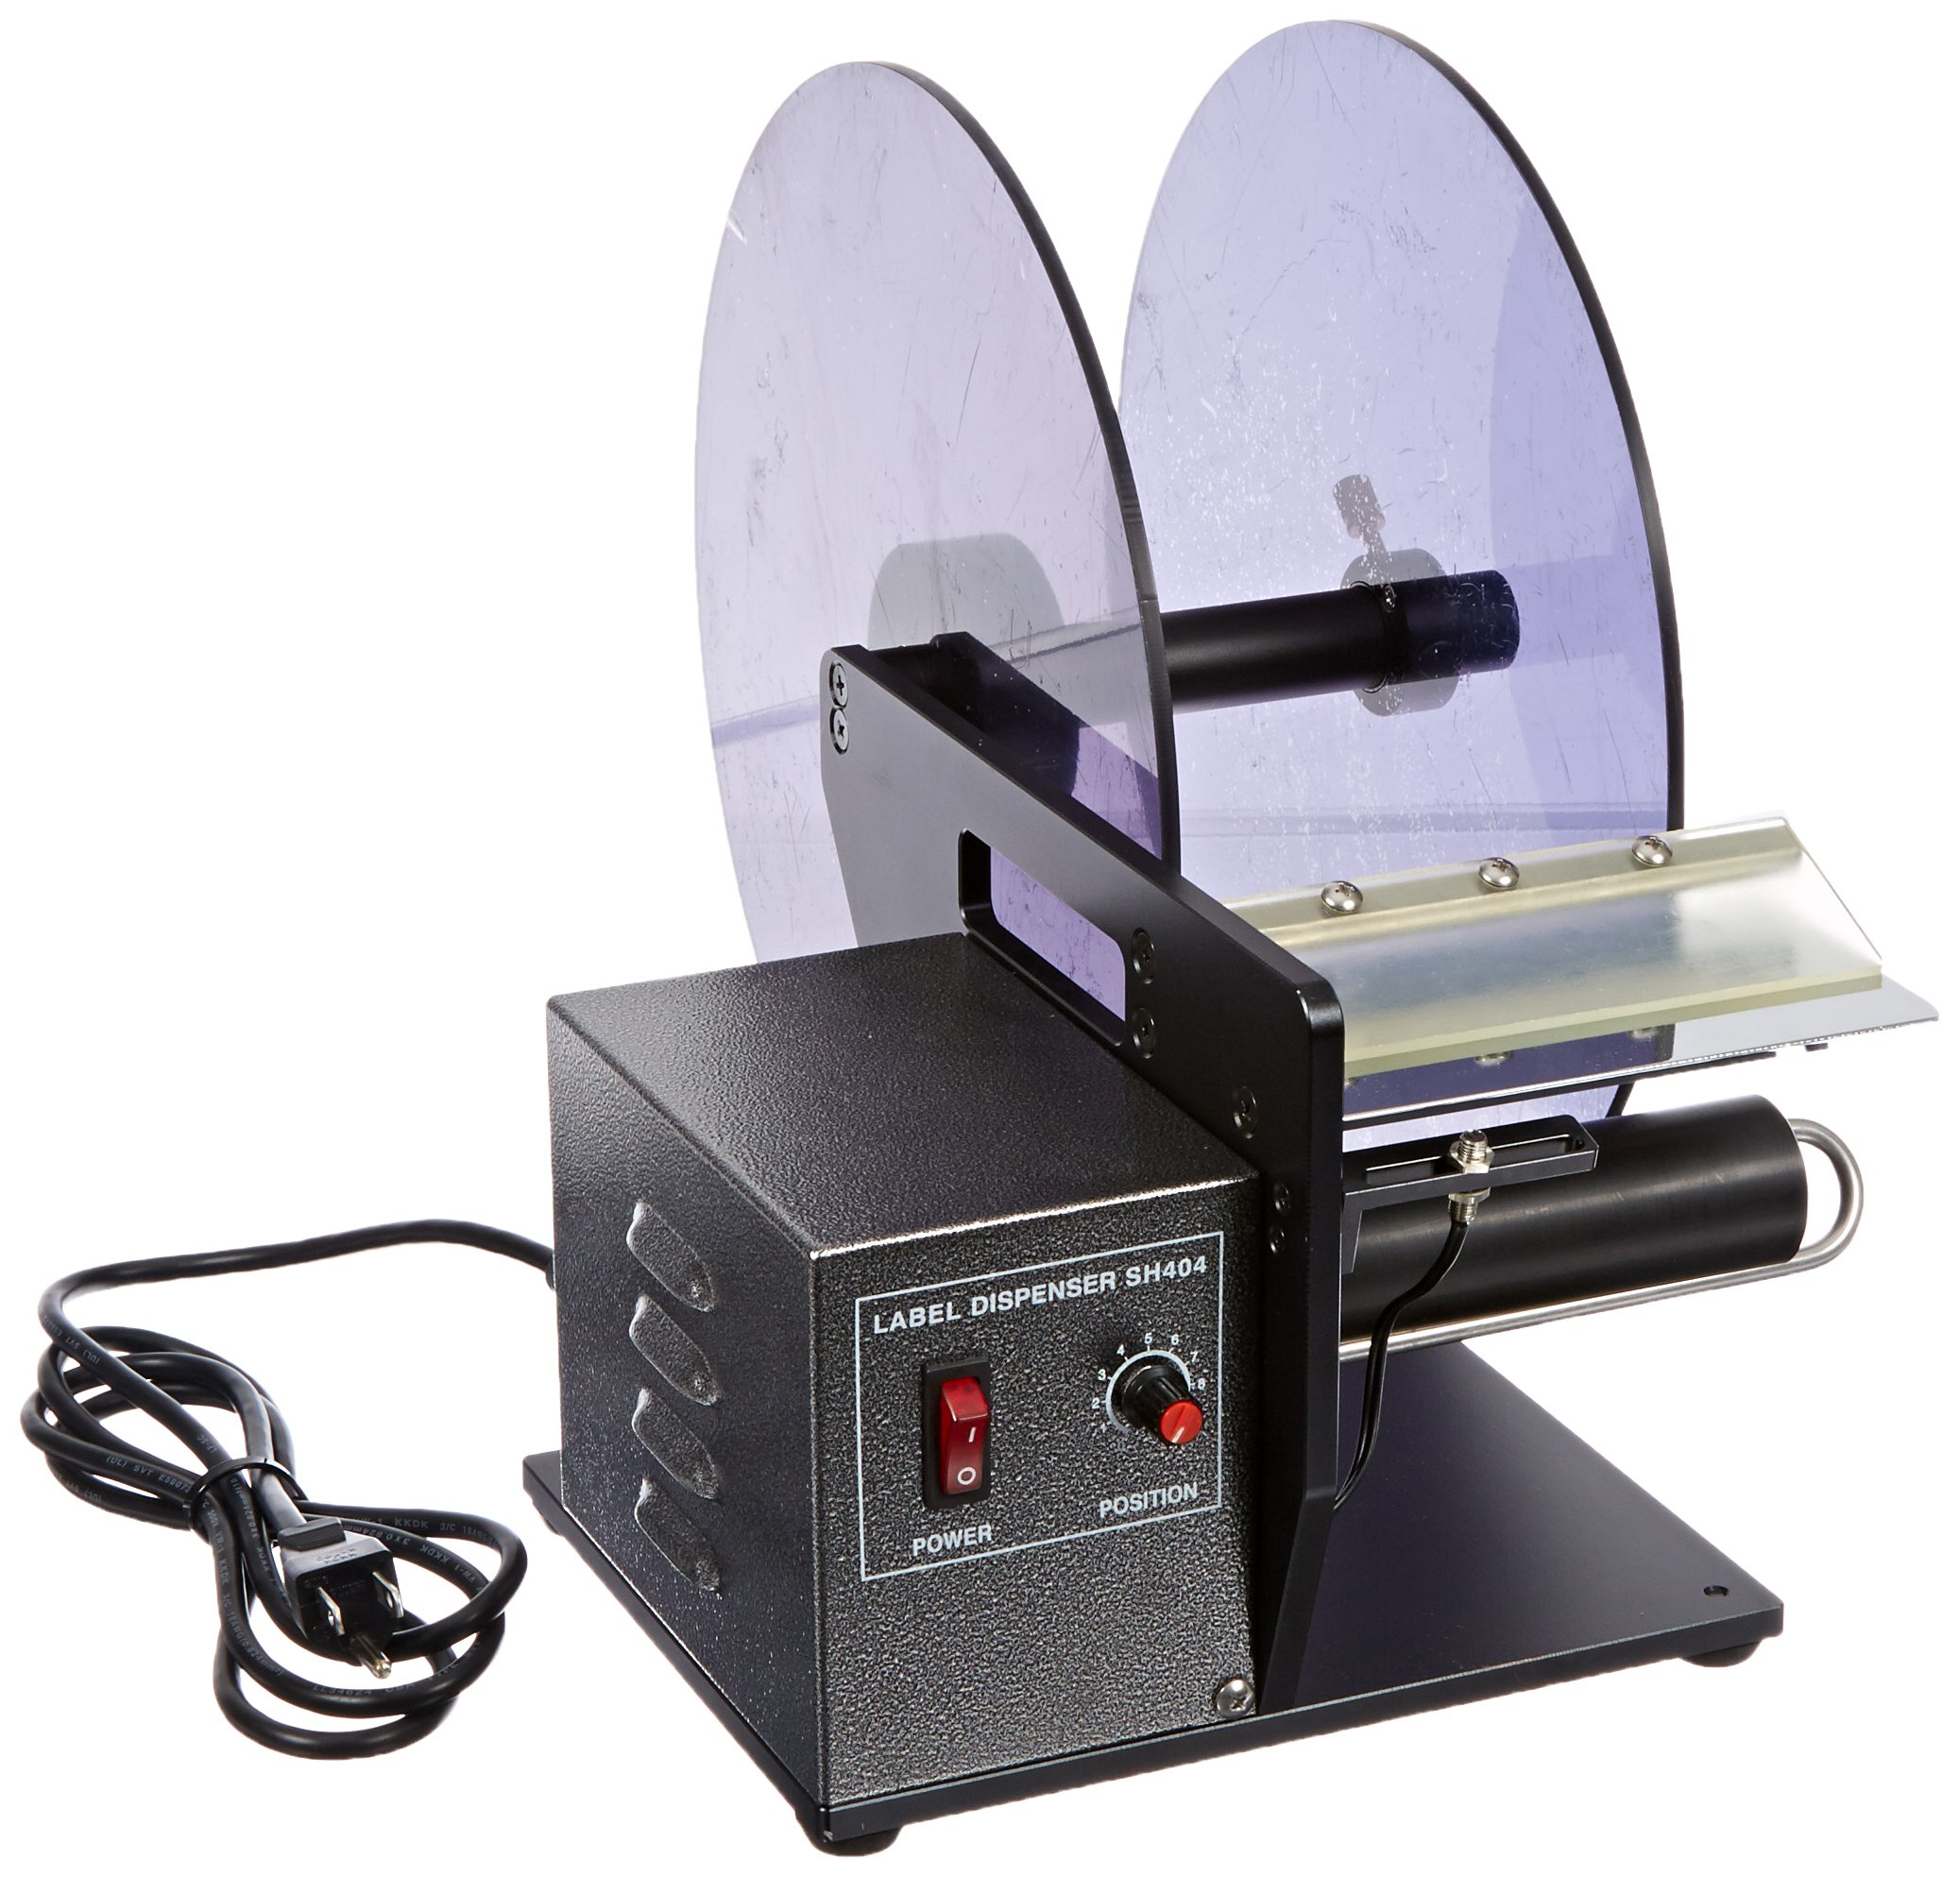 Tach-It SH404TR Premium Semi-Automatic Label Dispenser